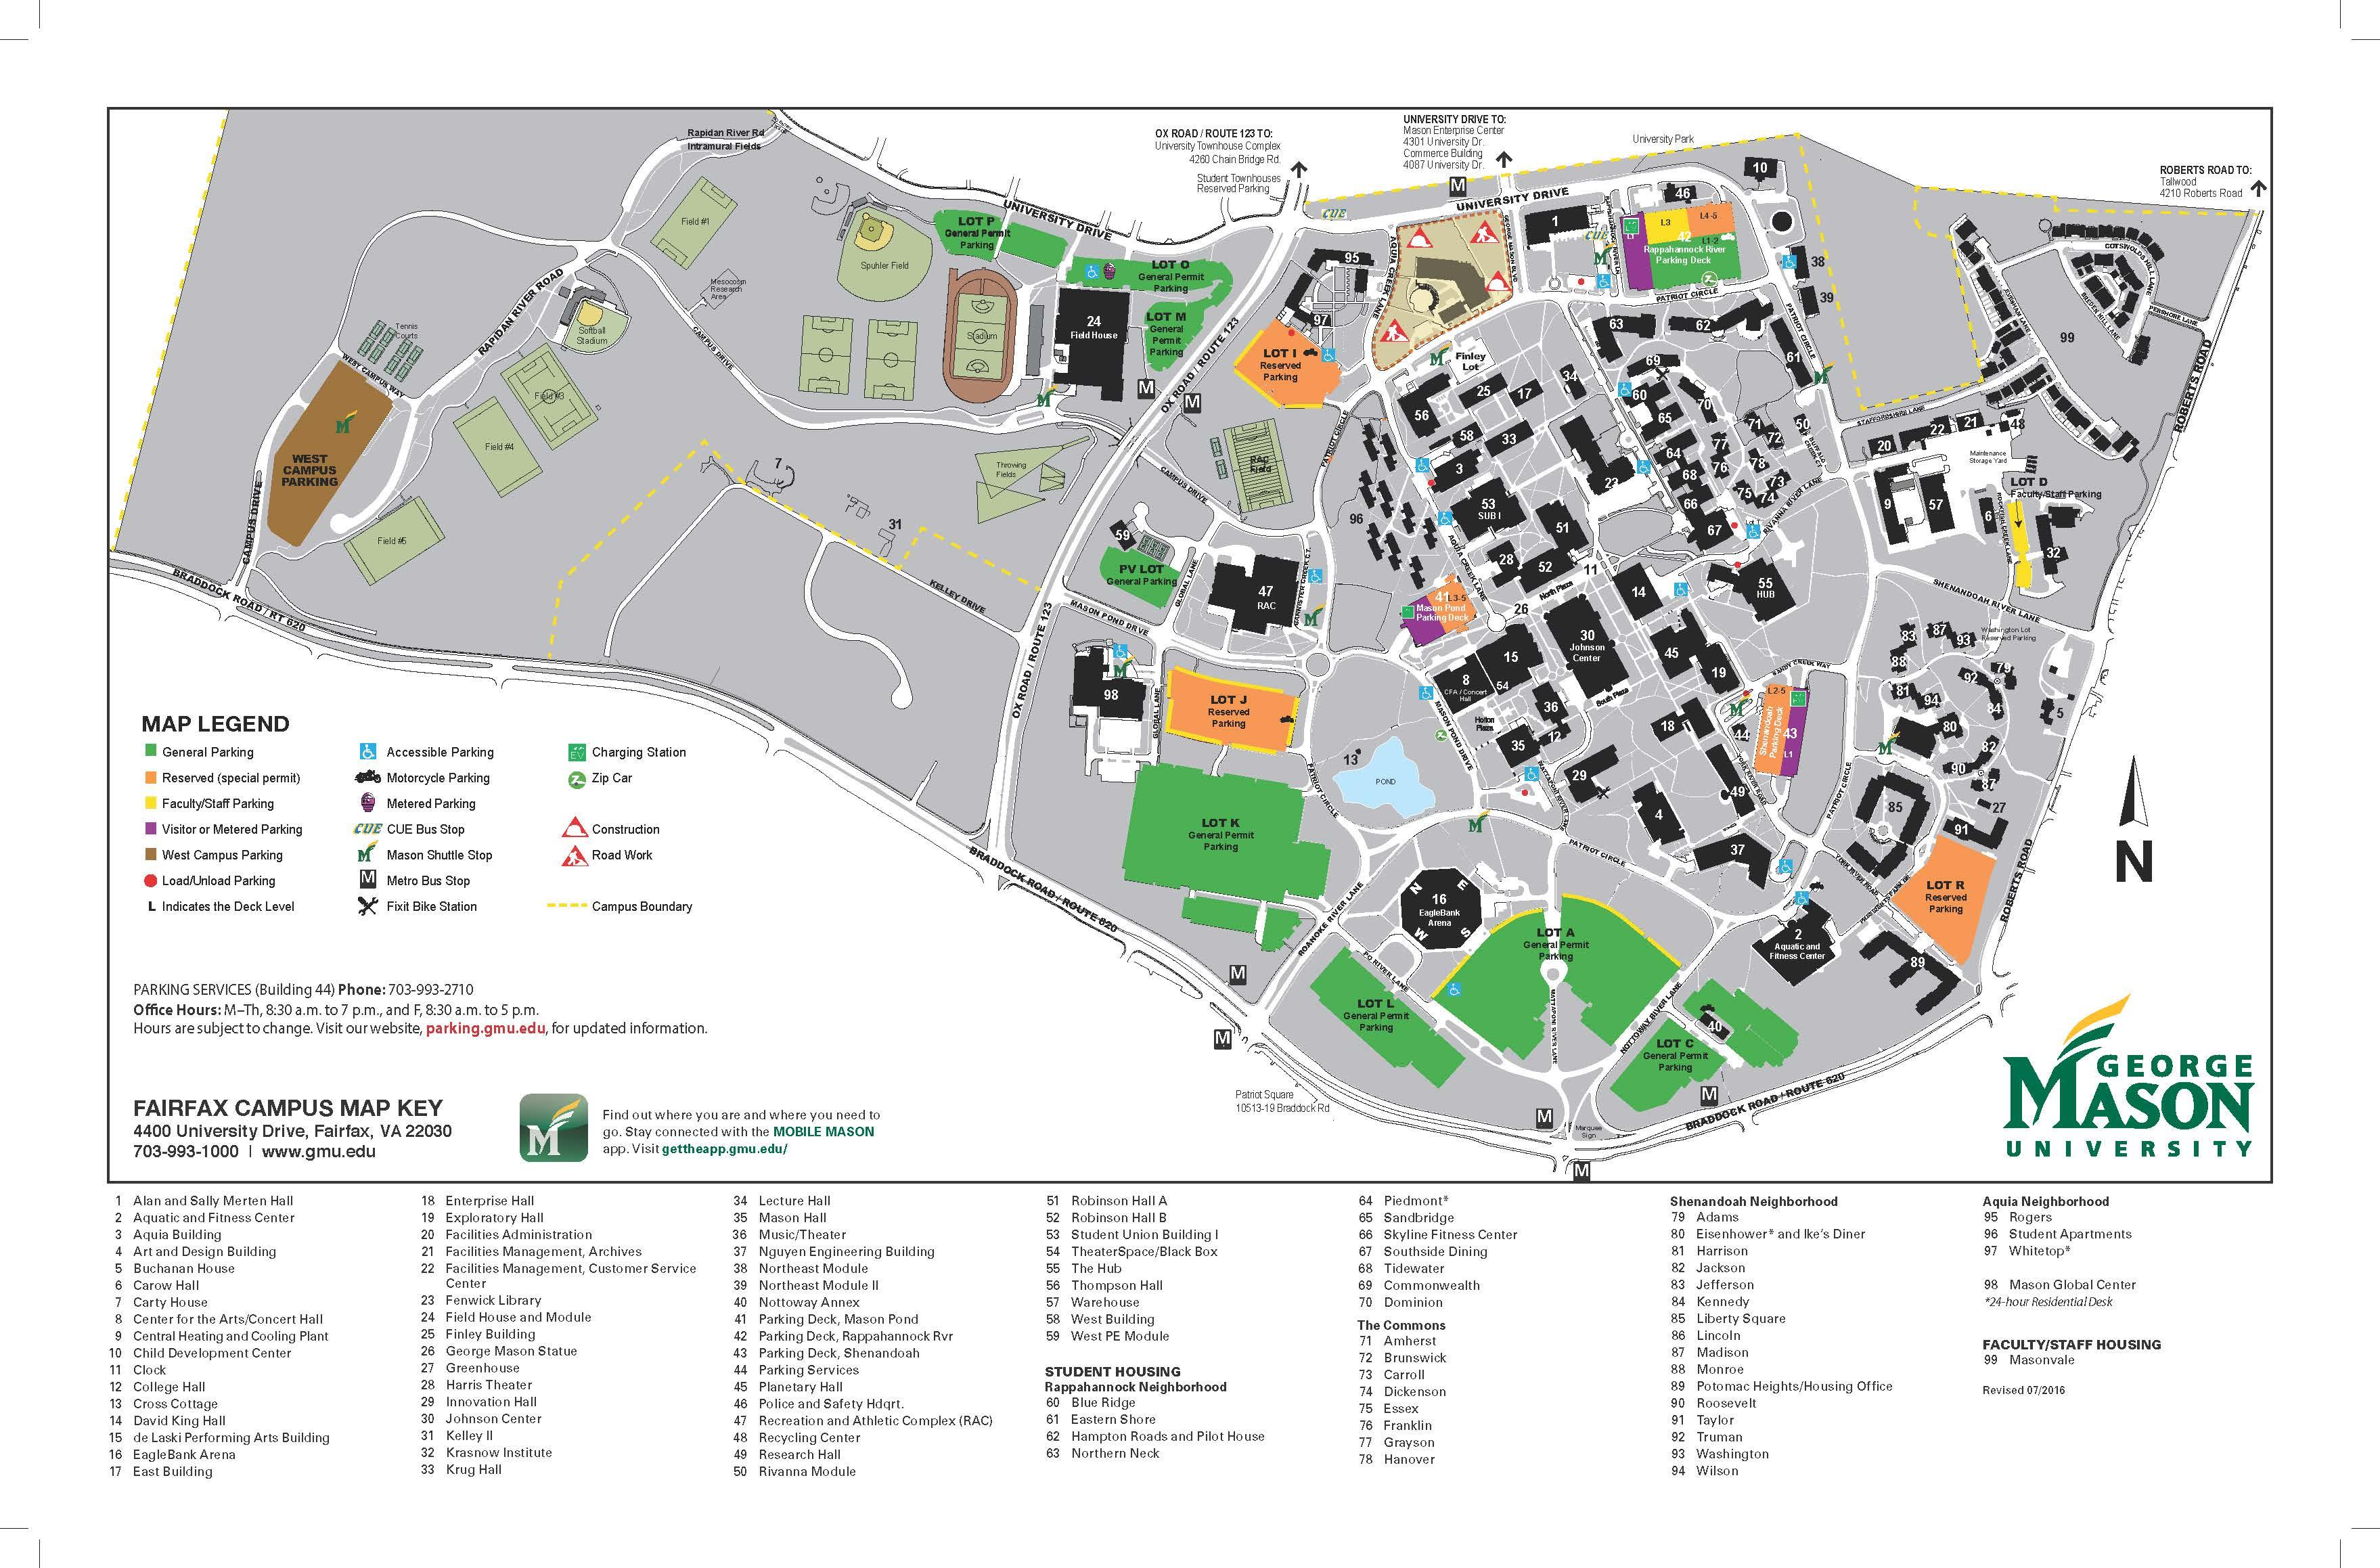 George Mason University Campus Map - induced.info